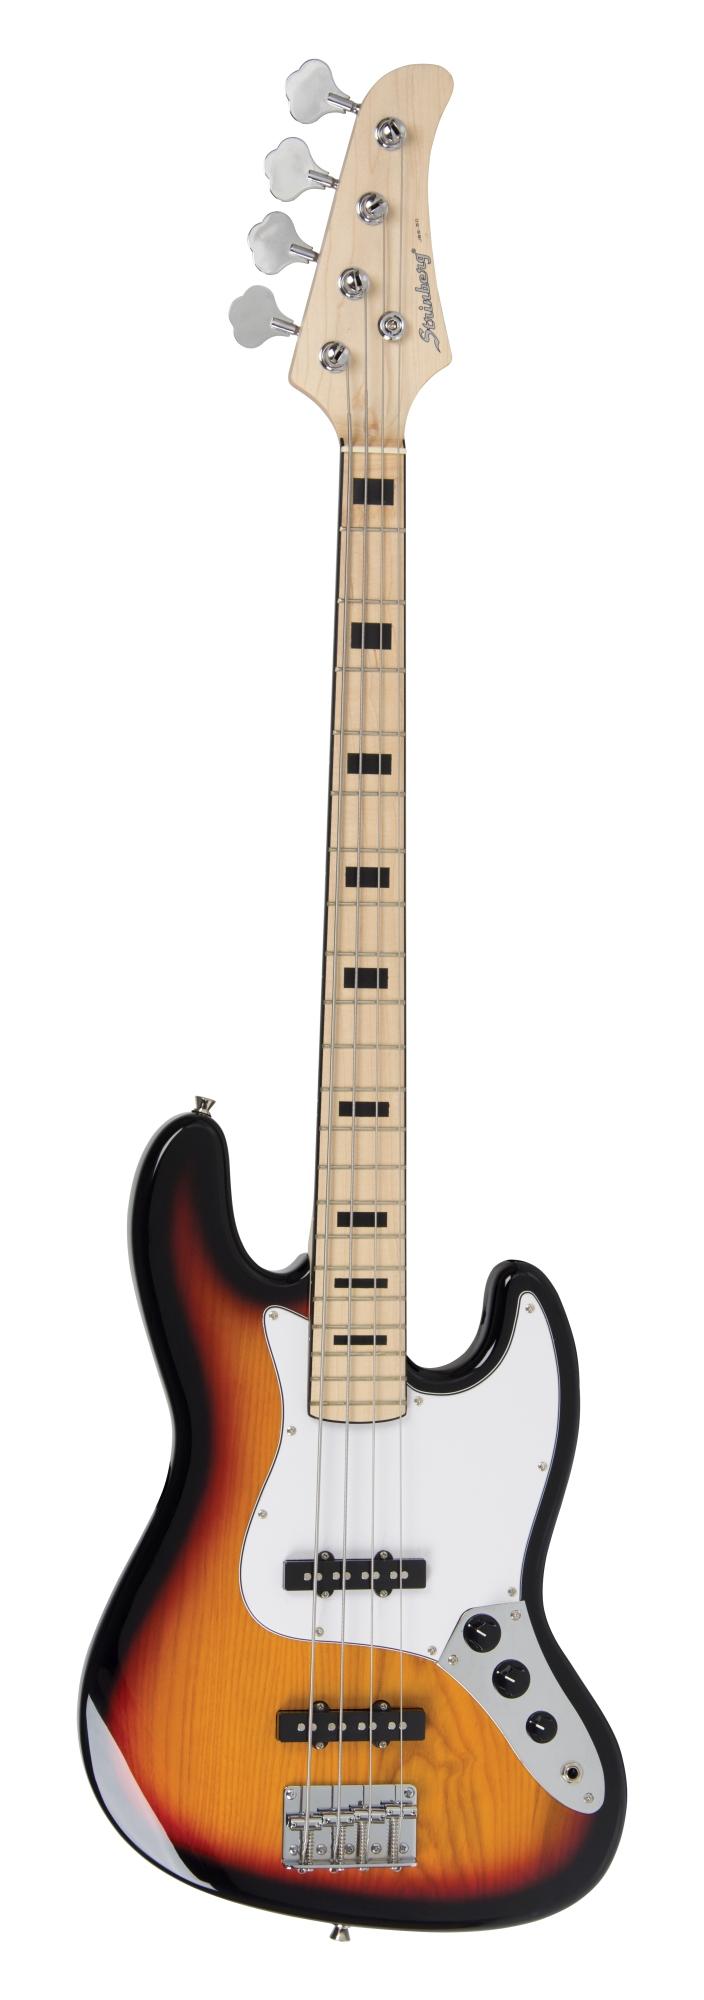 Contrabaixo Strinberg Jbs50 Sb Jazz Bass